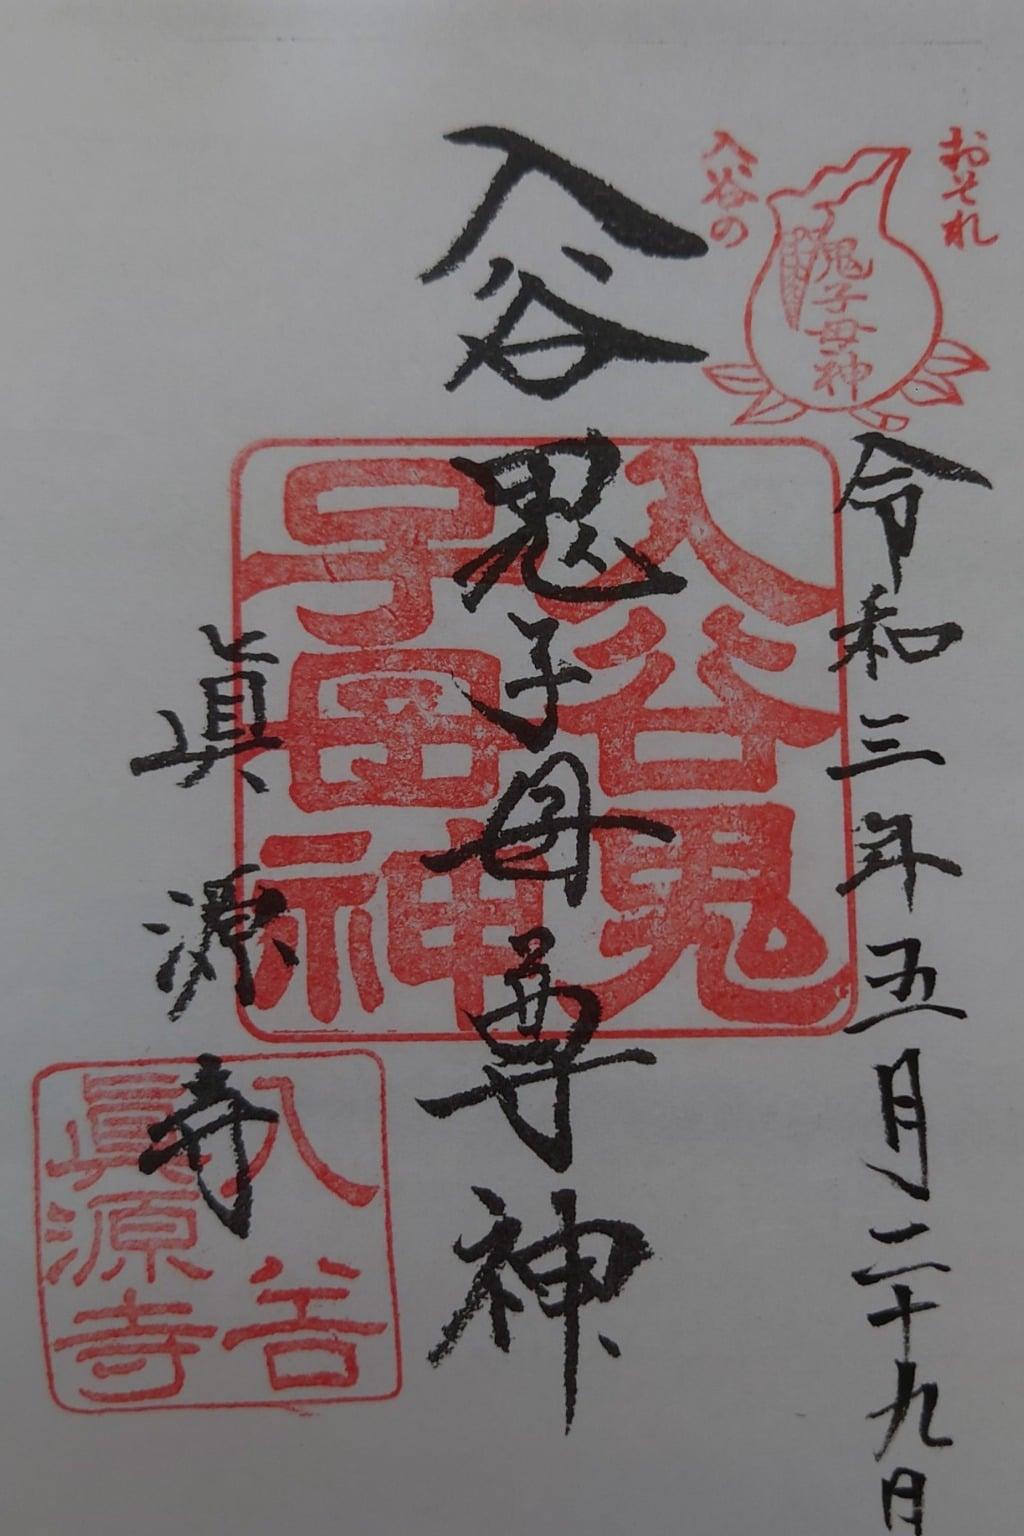 真源寺(入谷鬼子母神)の御朱印